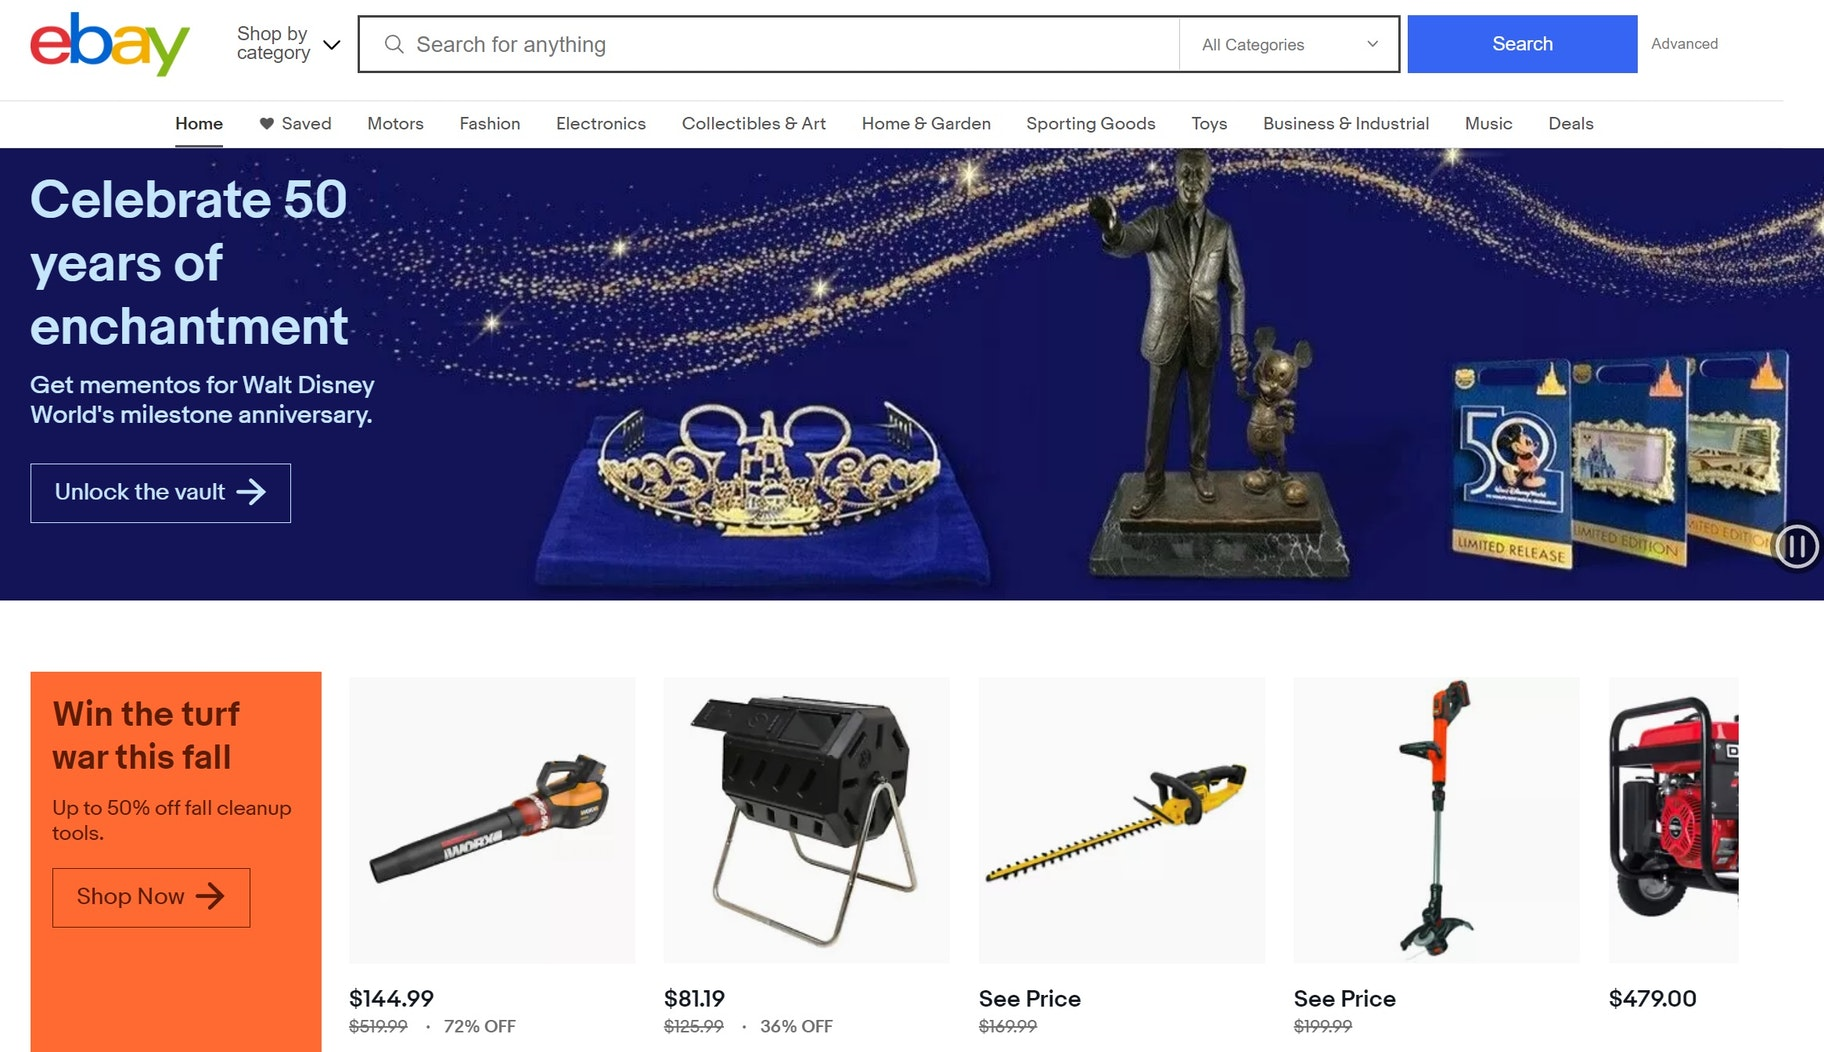 shopify competitors eBay